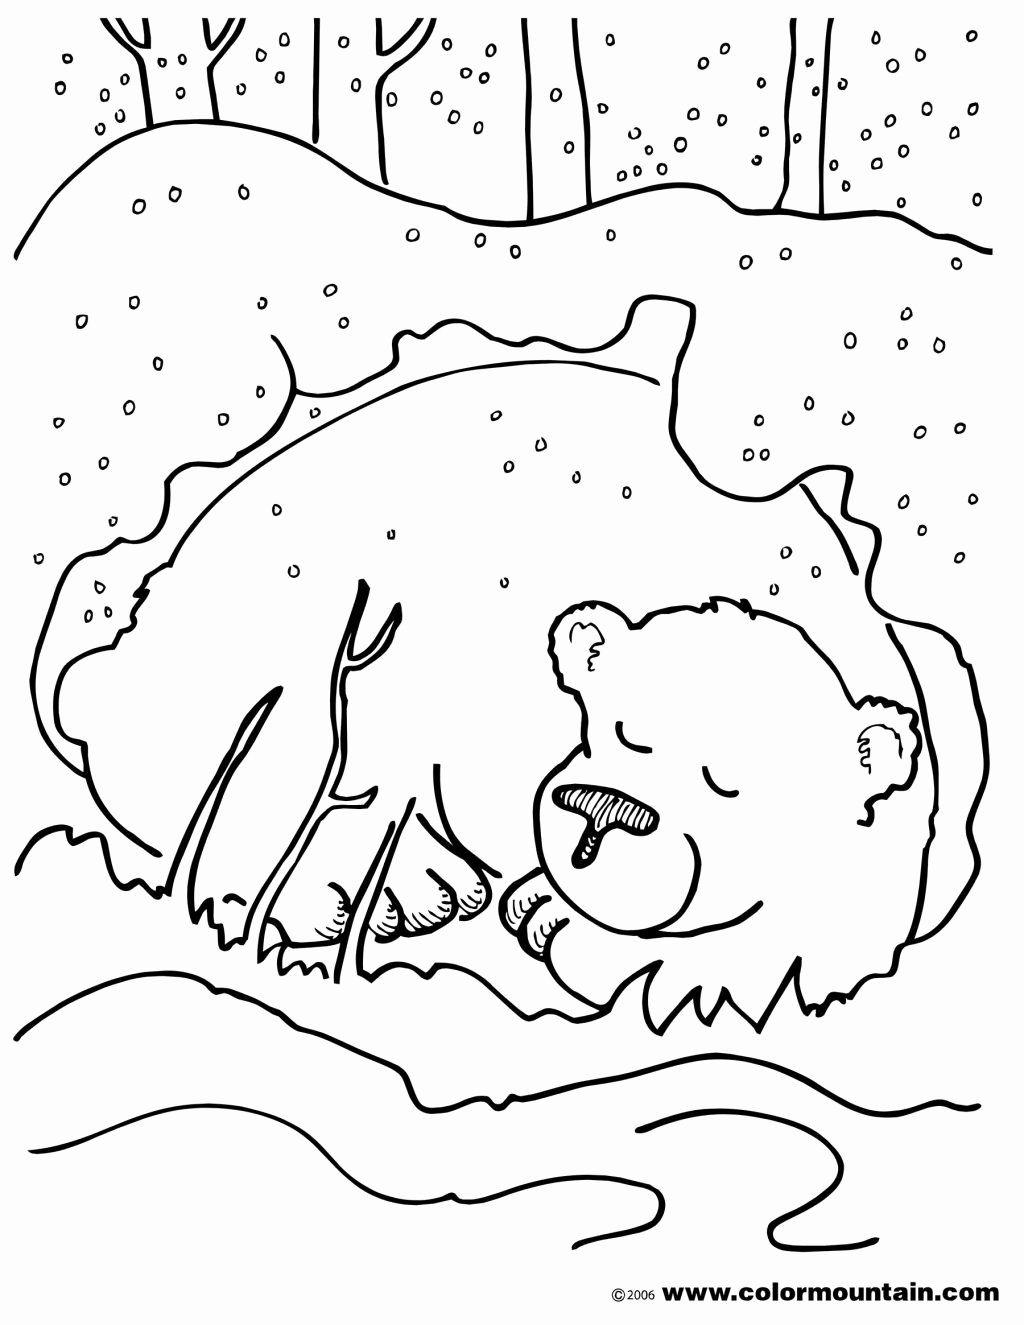 Coloring Pages Hibernating Animals